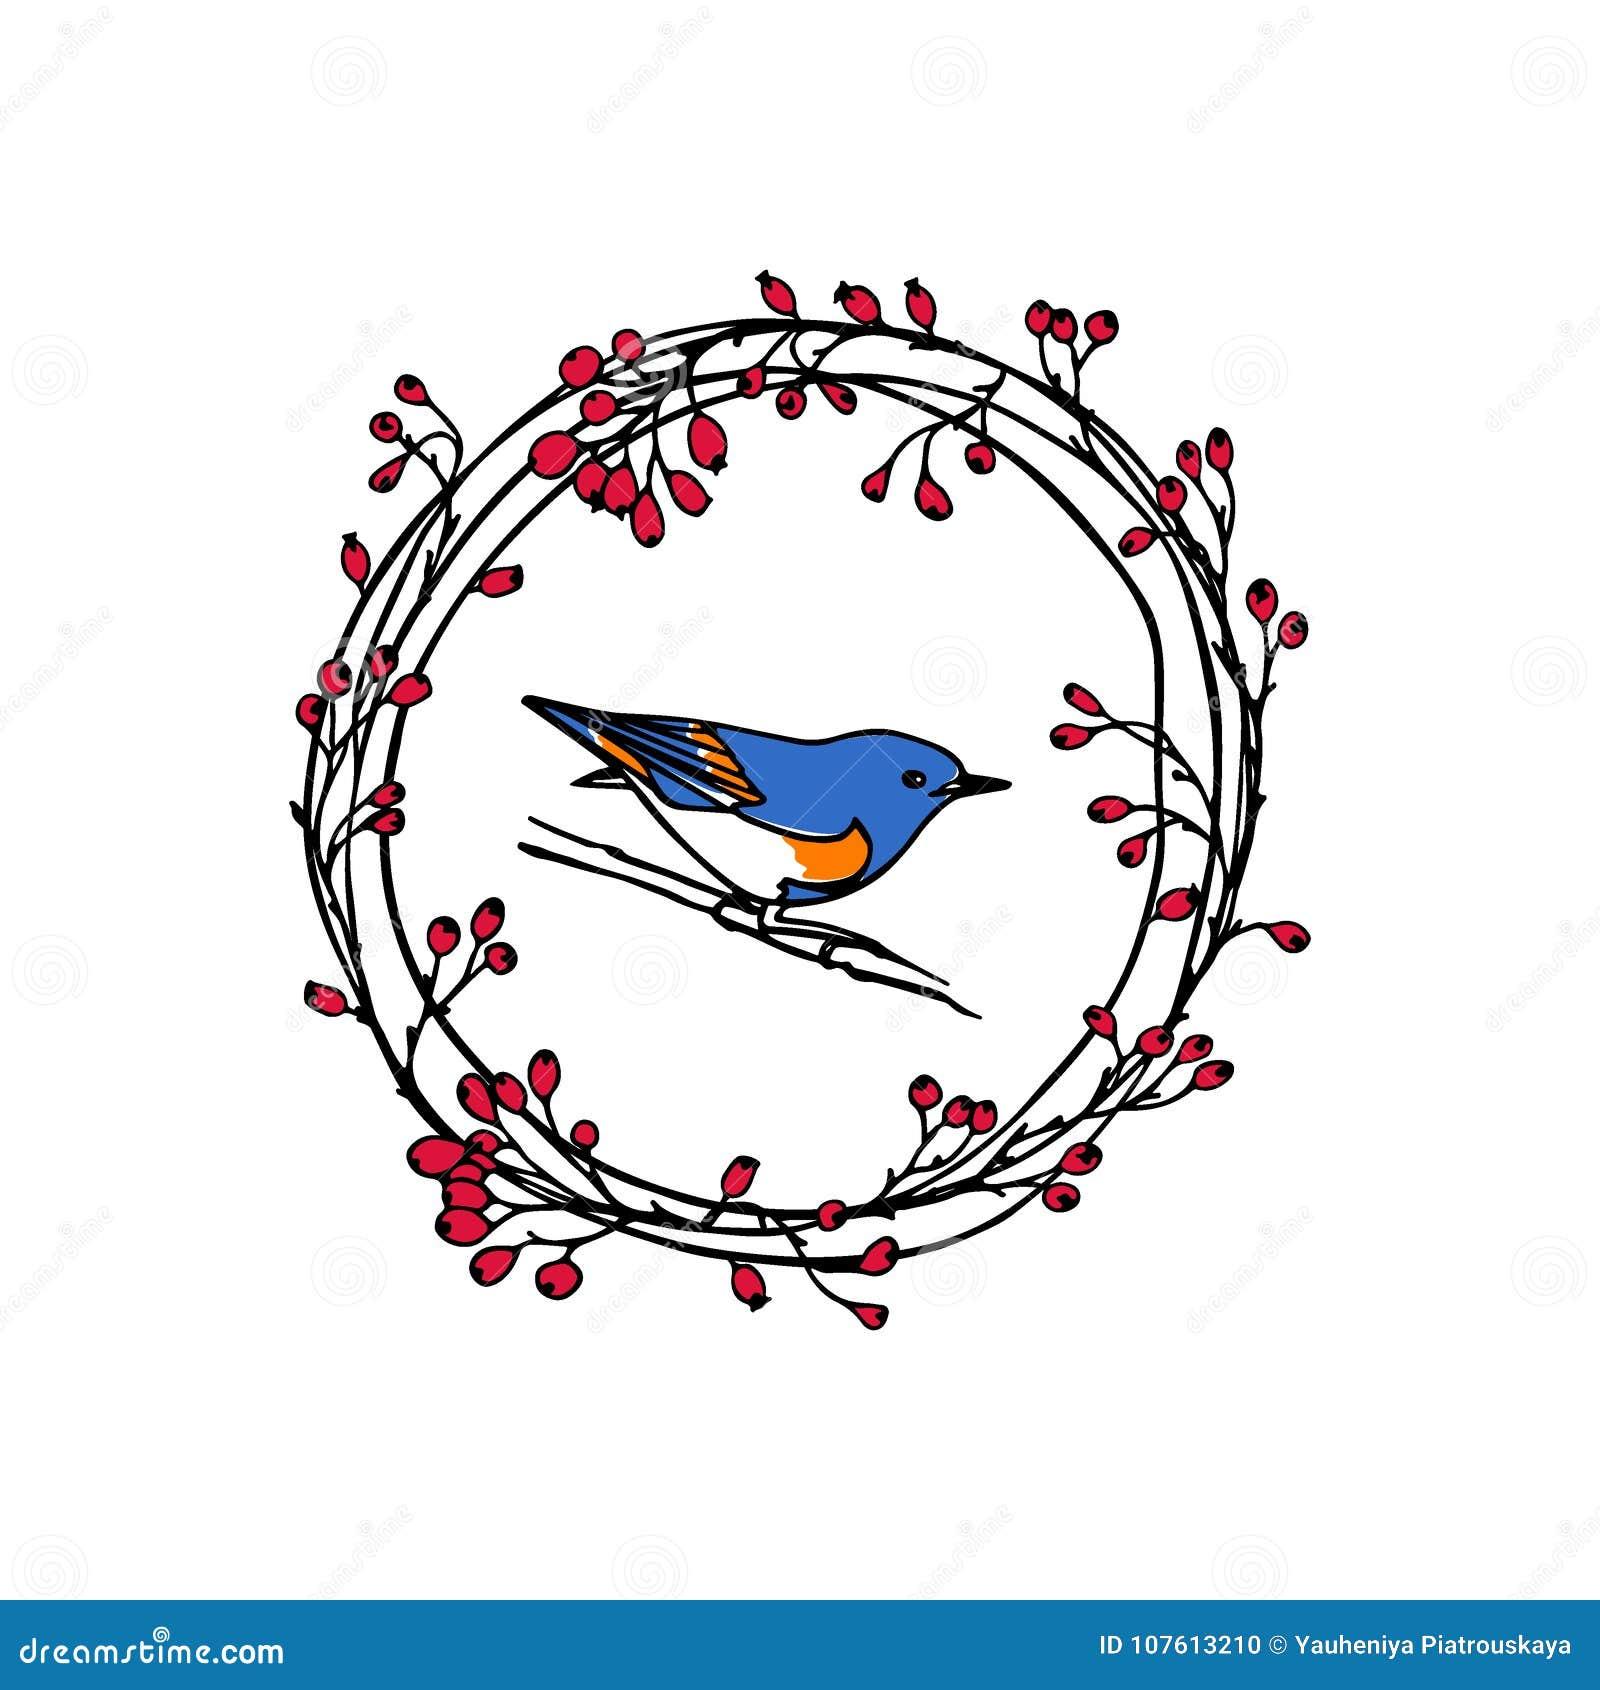 Hand drawn bird emblem stock vector. Illustration of botany - 107613210